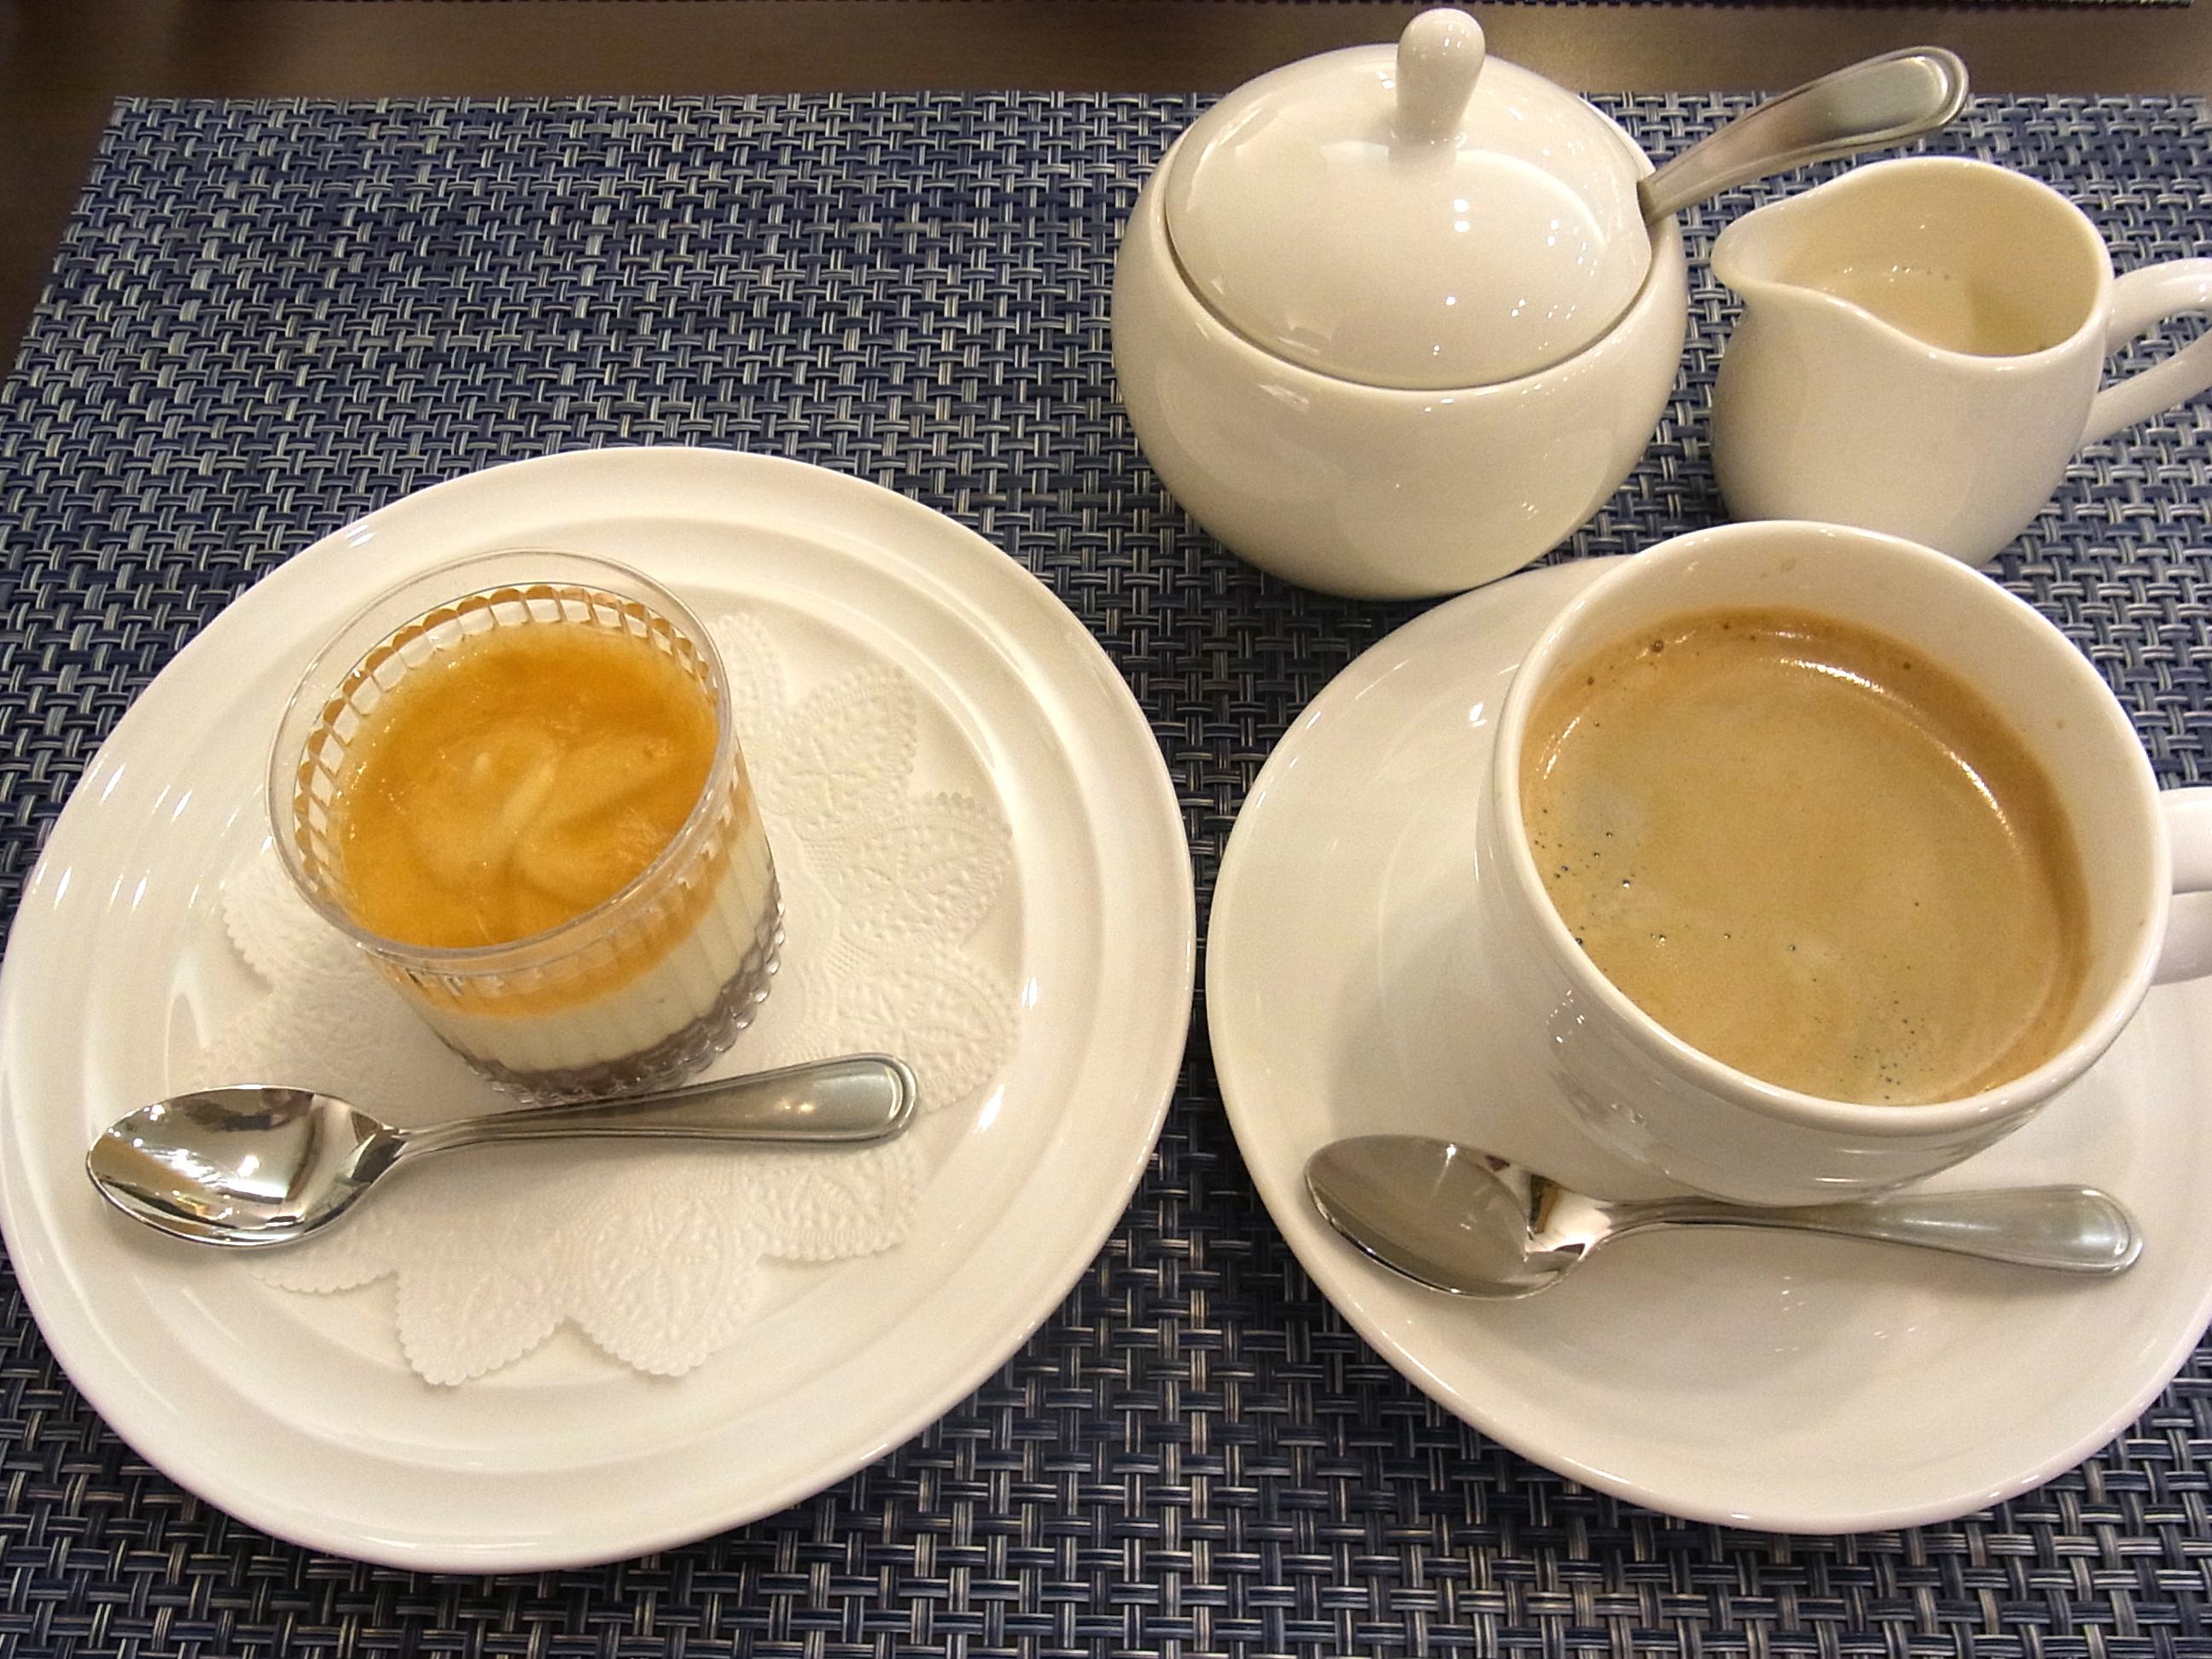 CHOICEVeganチーズのレアチーズケーキとコーヒー